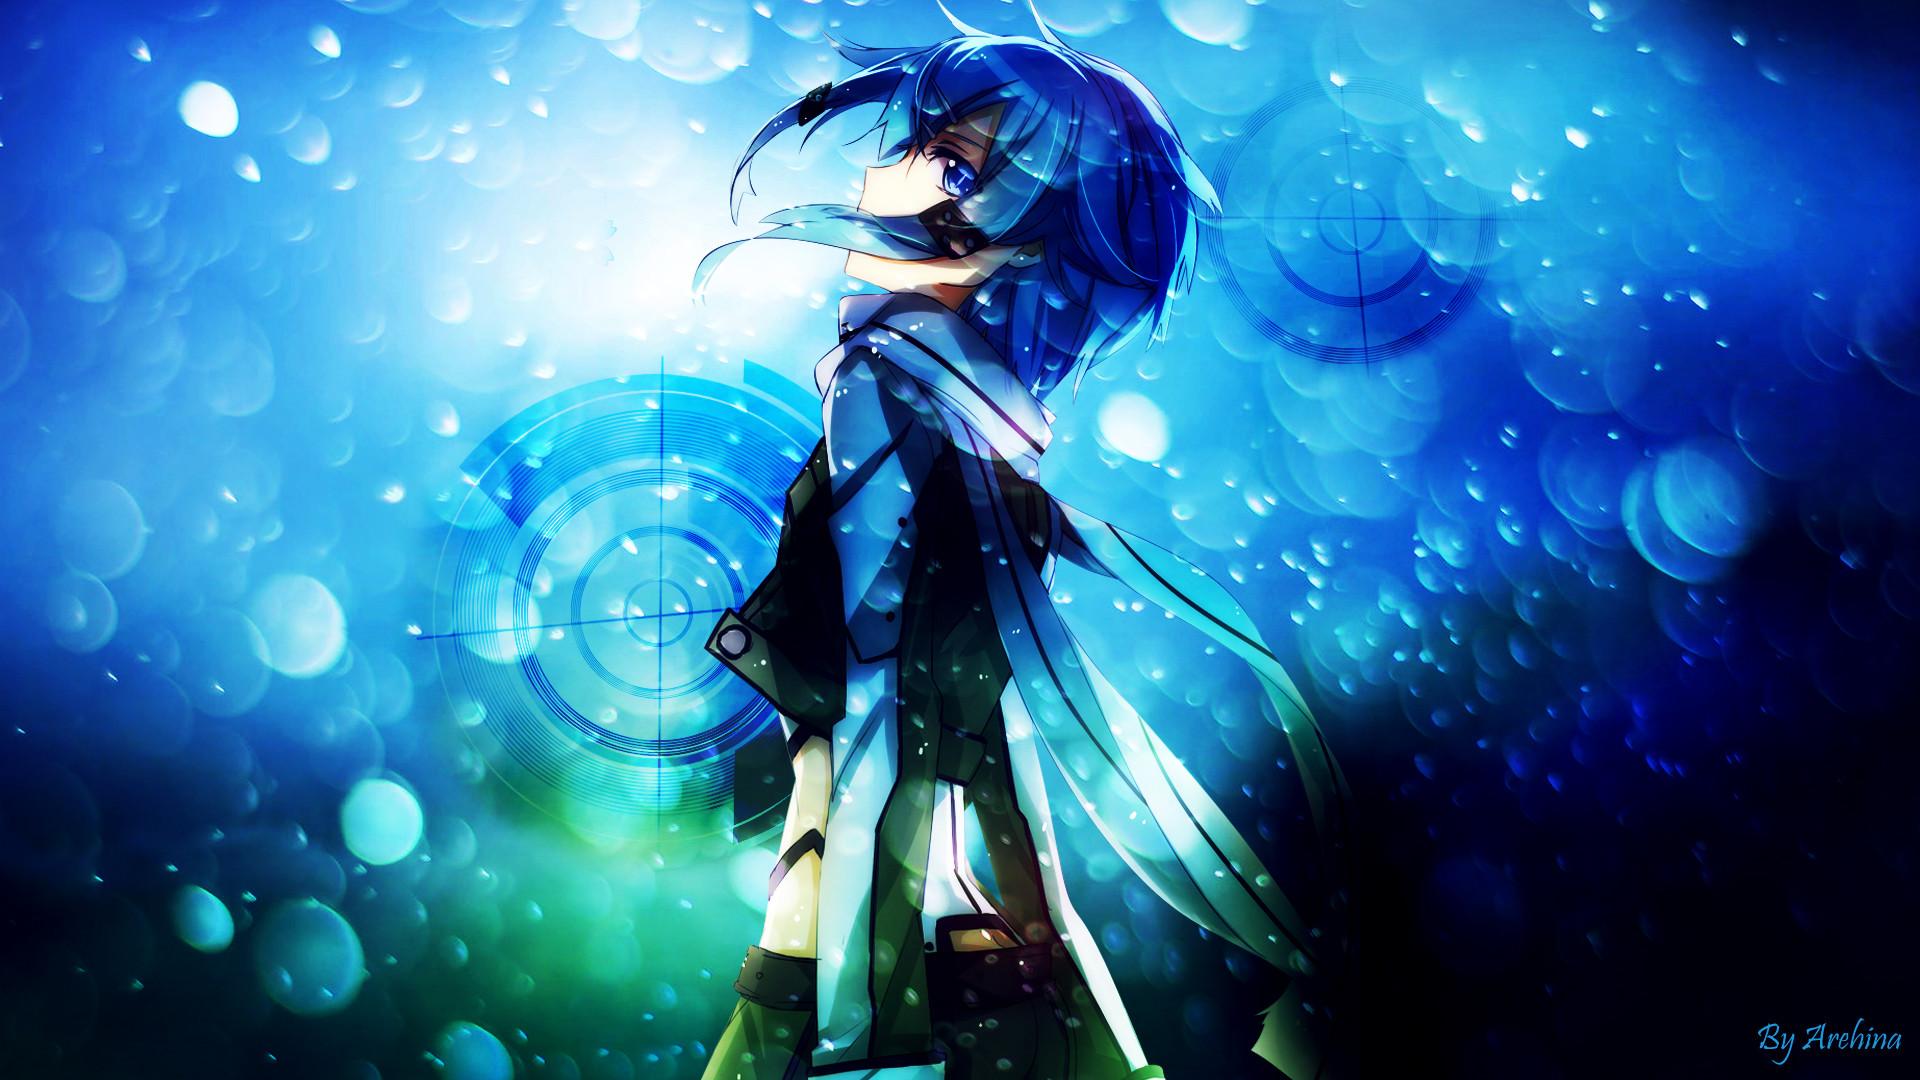 Sword art online 2 (GGO) Sinon Wallpaper by Arehina.deviantart.com on